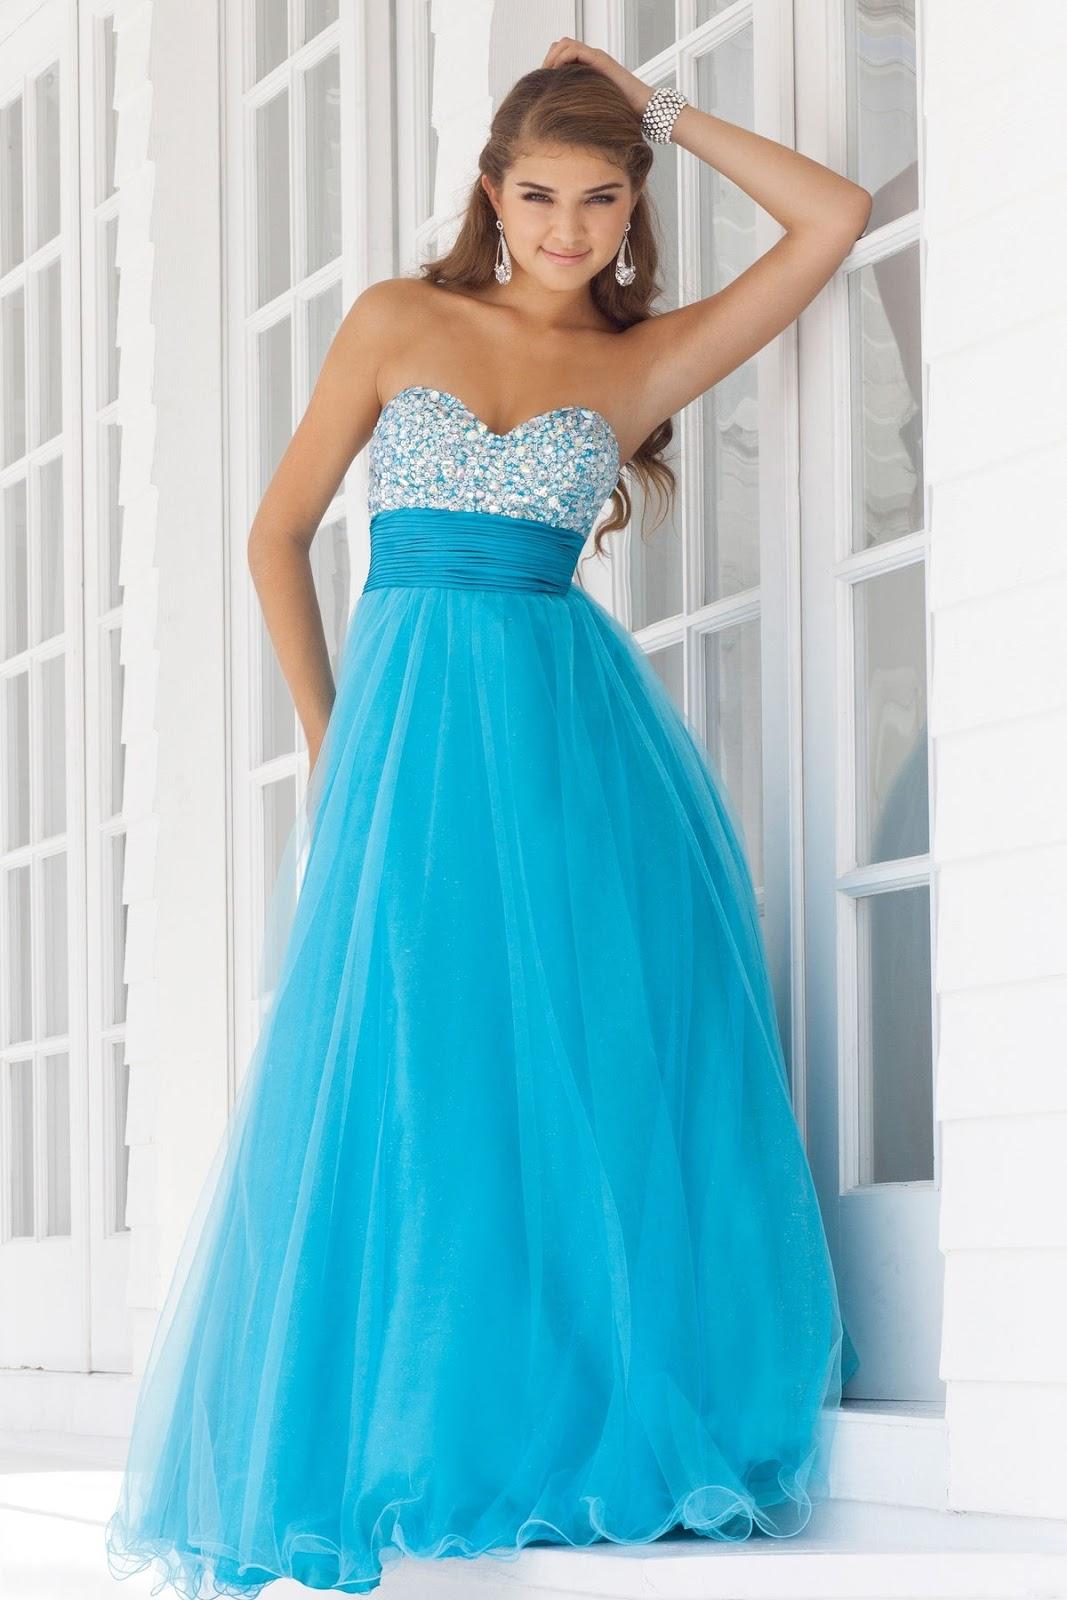 Plus Size Prom Dresses Ebay – DACC